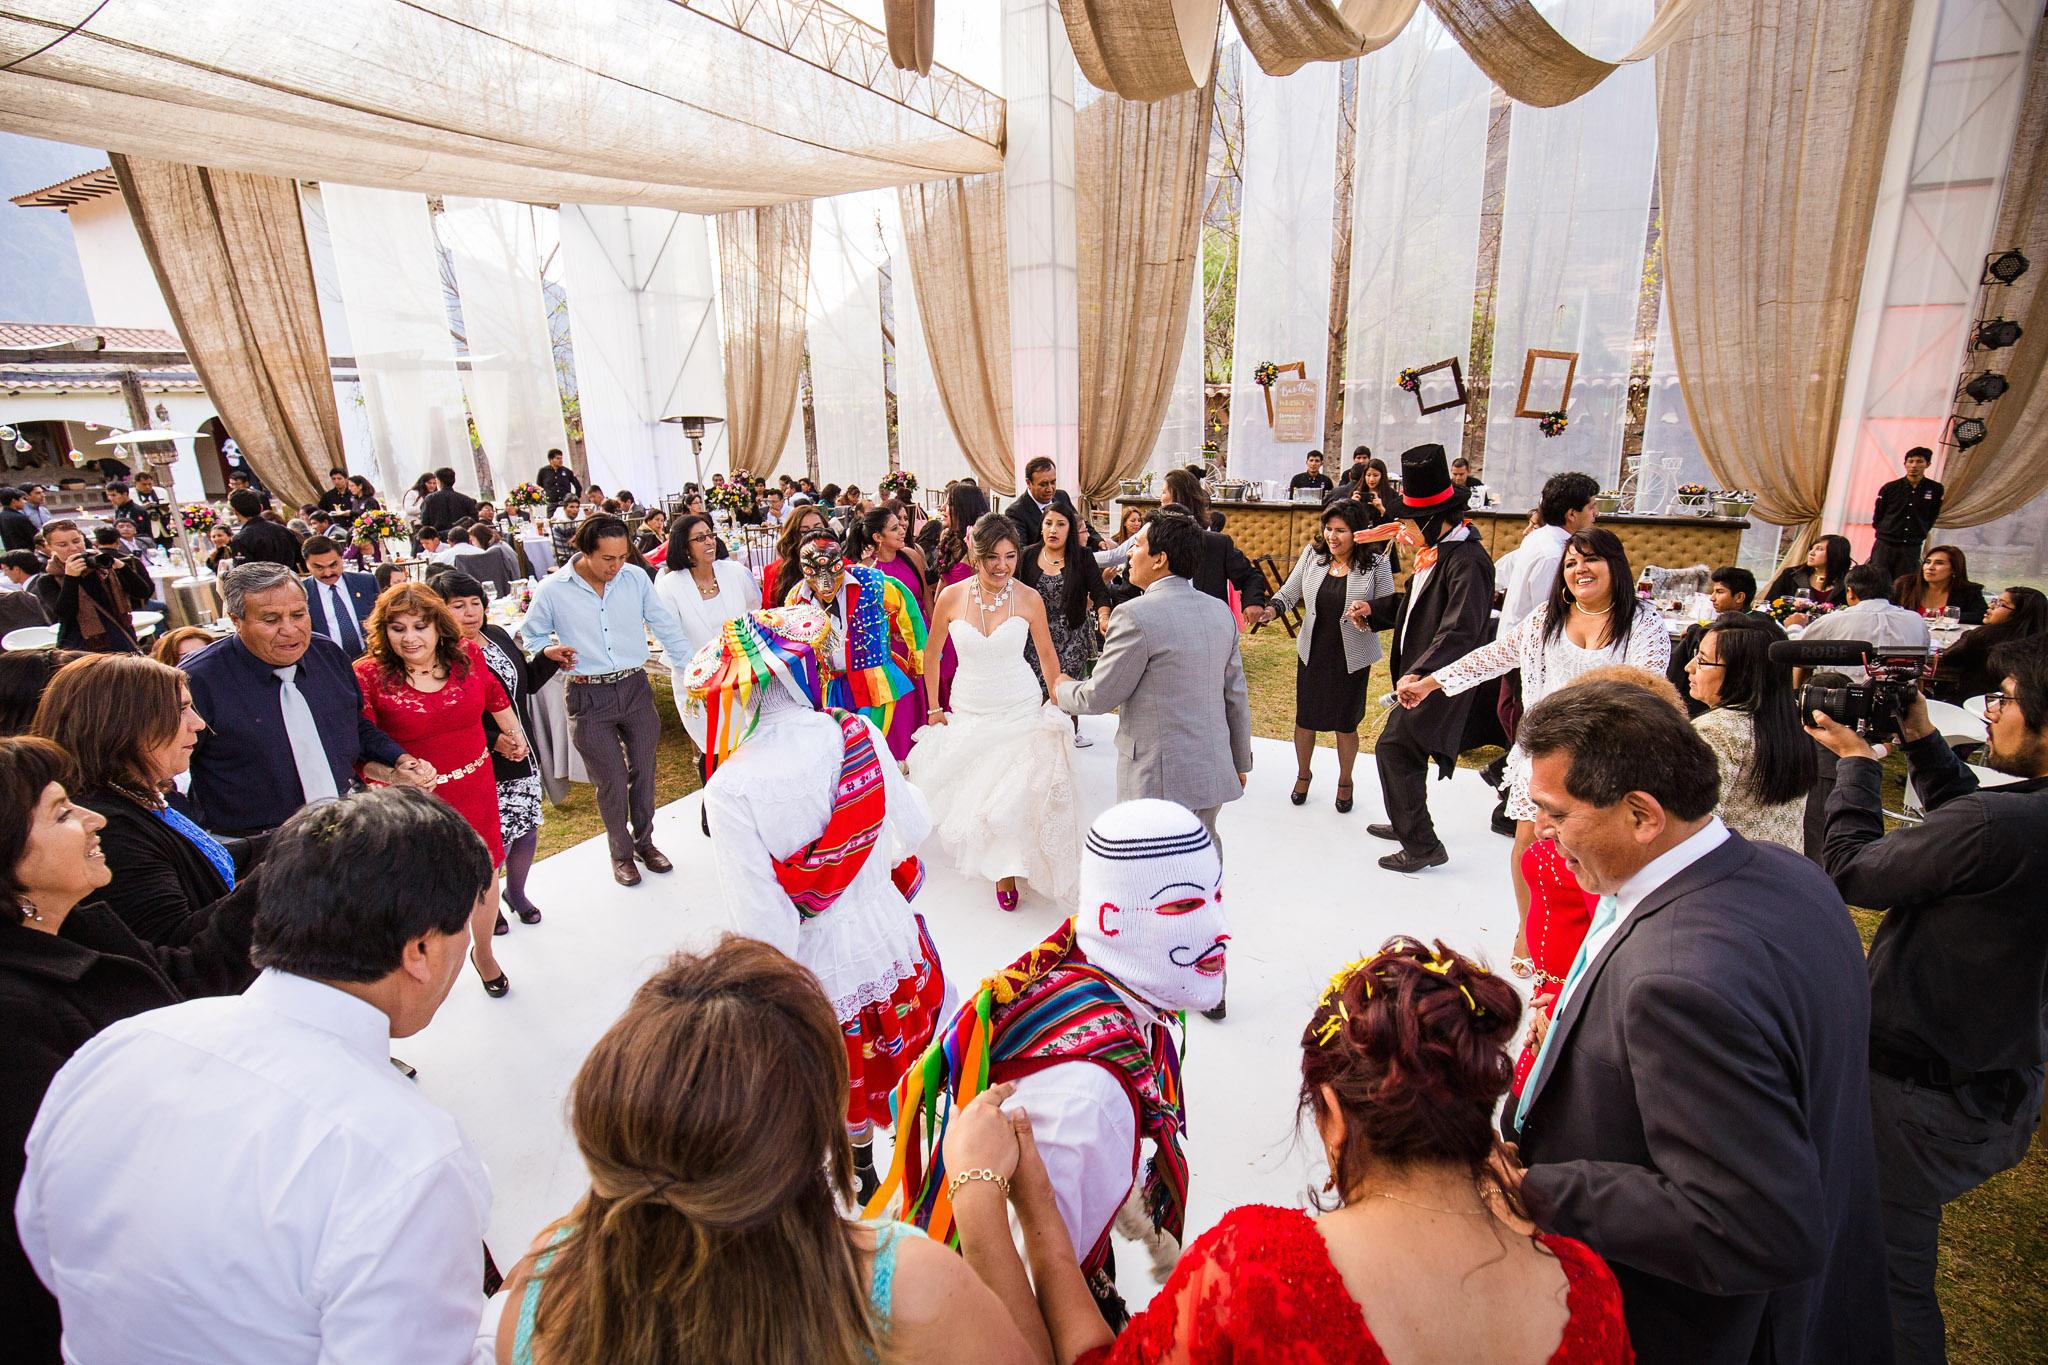 Wedding-Travellers-Destination-Wedding-Peru-Cusco-Hacienda-Sarapampa-Sacred-Valley-traditional-costume-entertainment-party